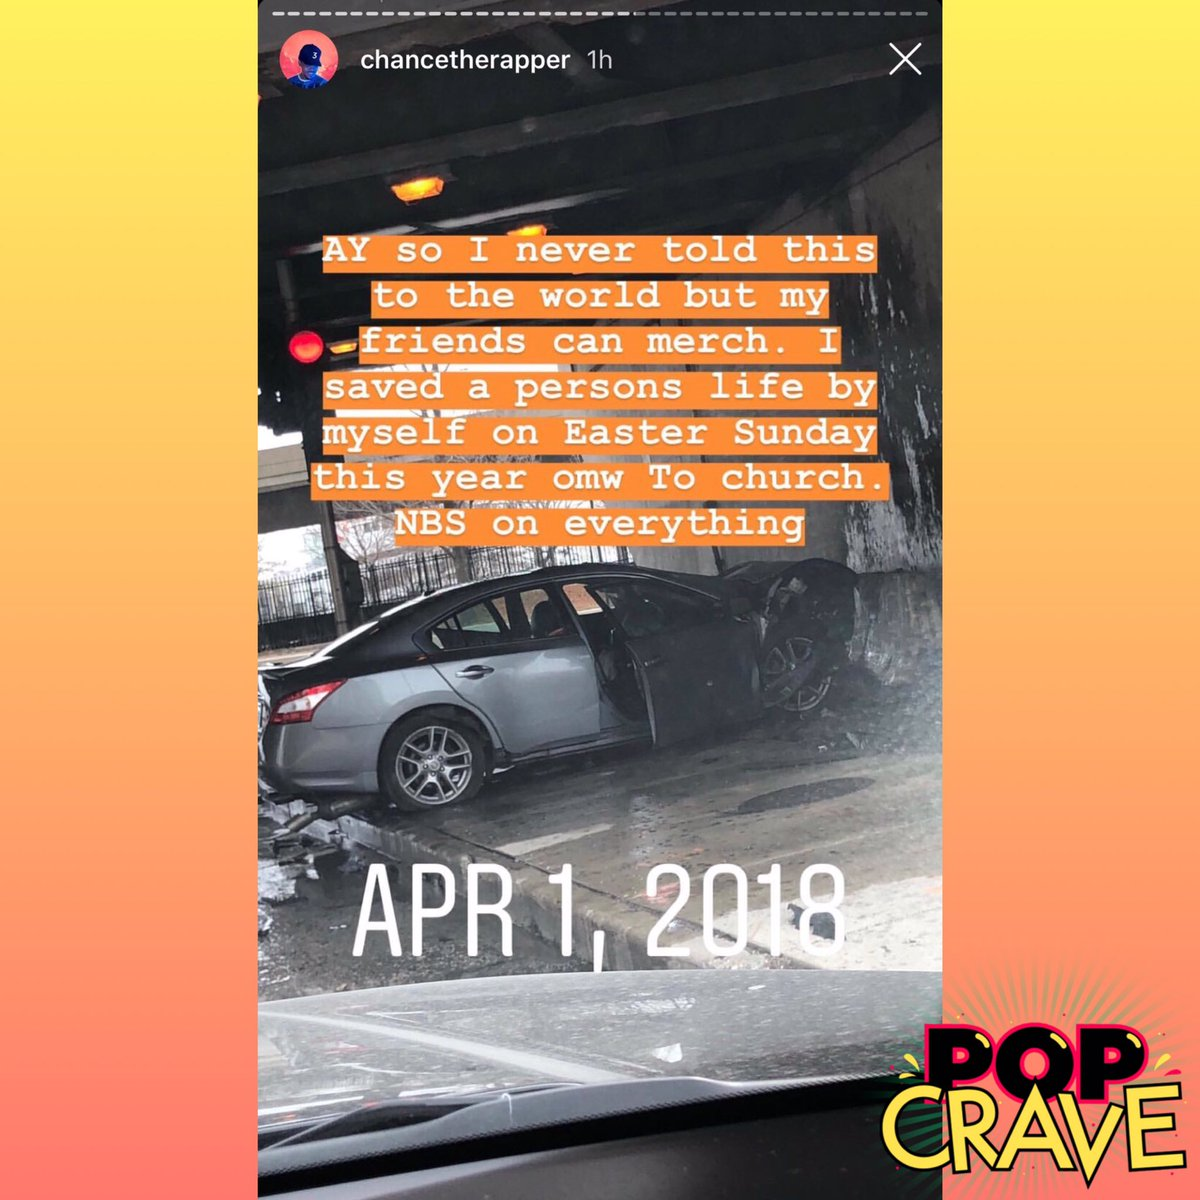 Pop Crave on Twitter: